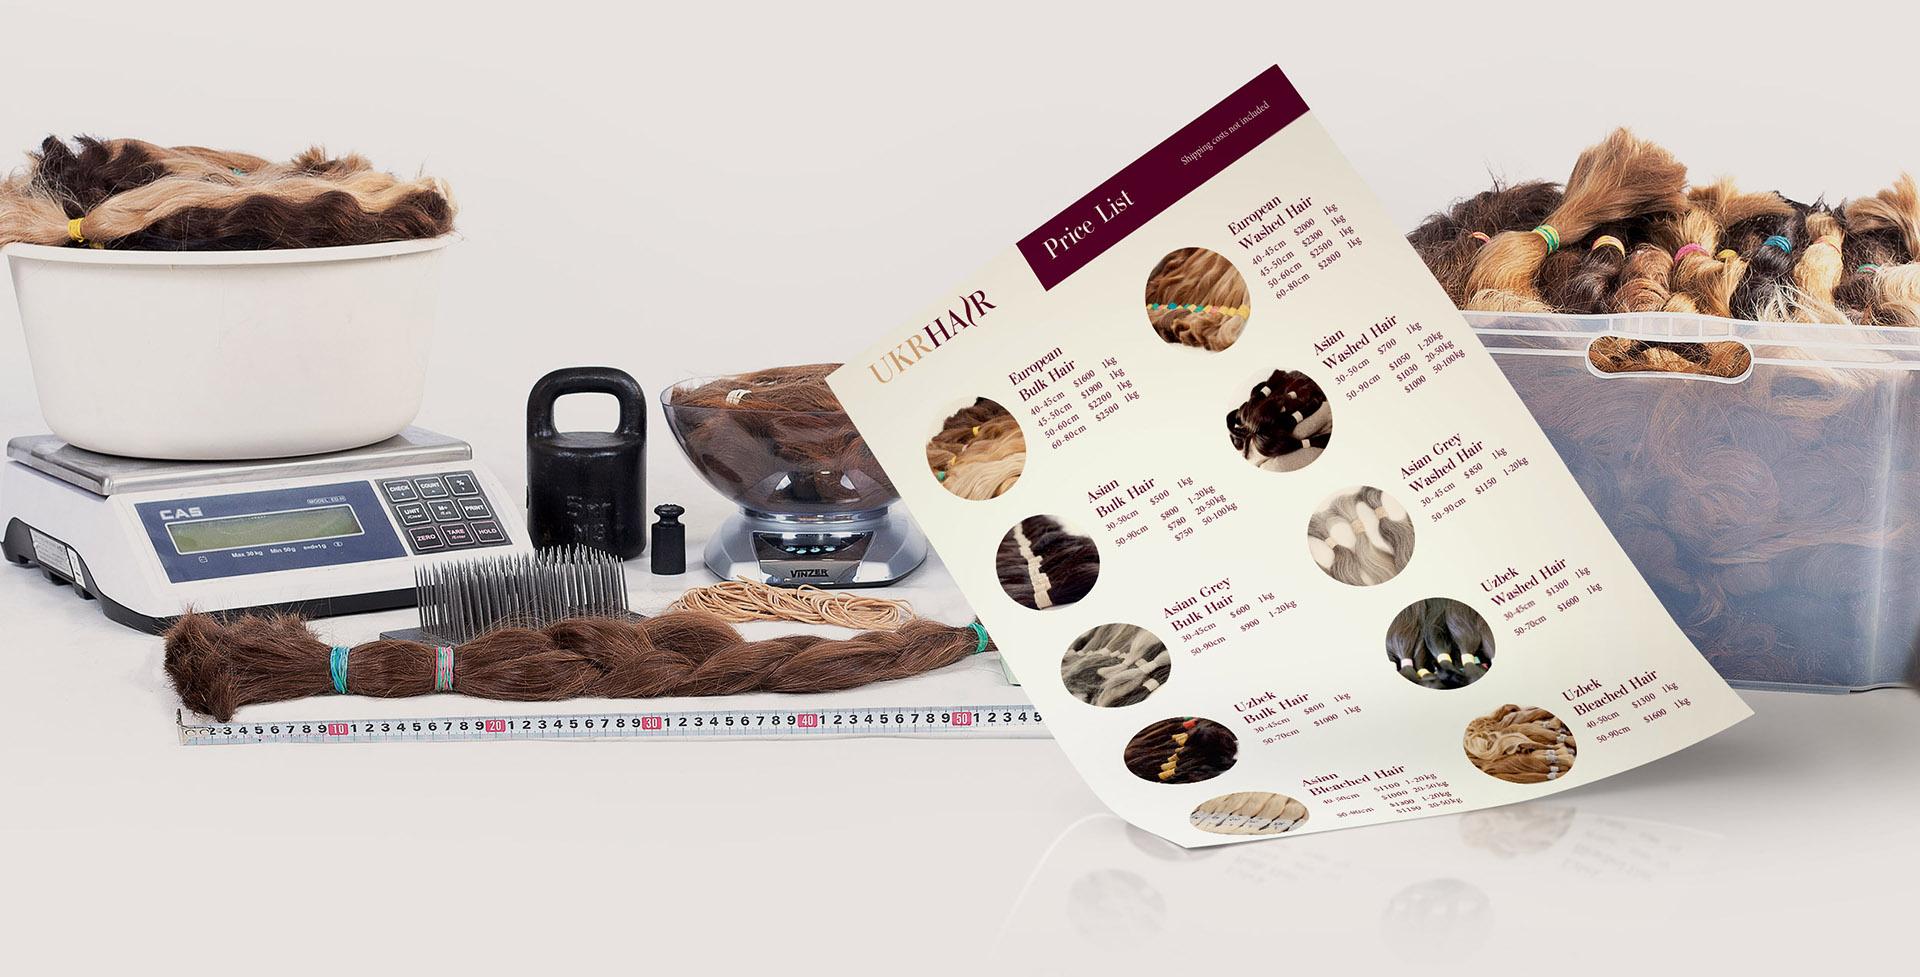 Development of the corporate identity of the company по продаже волос